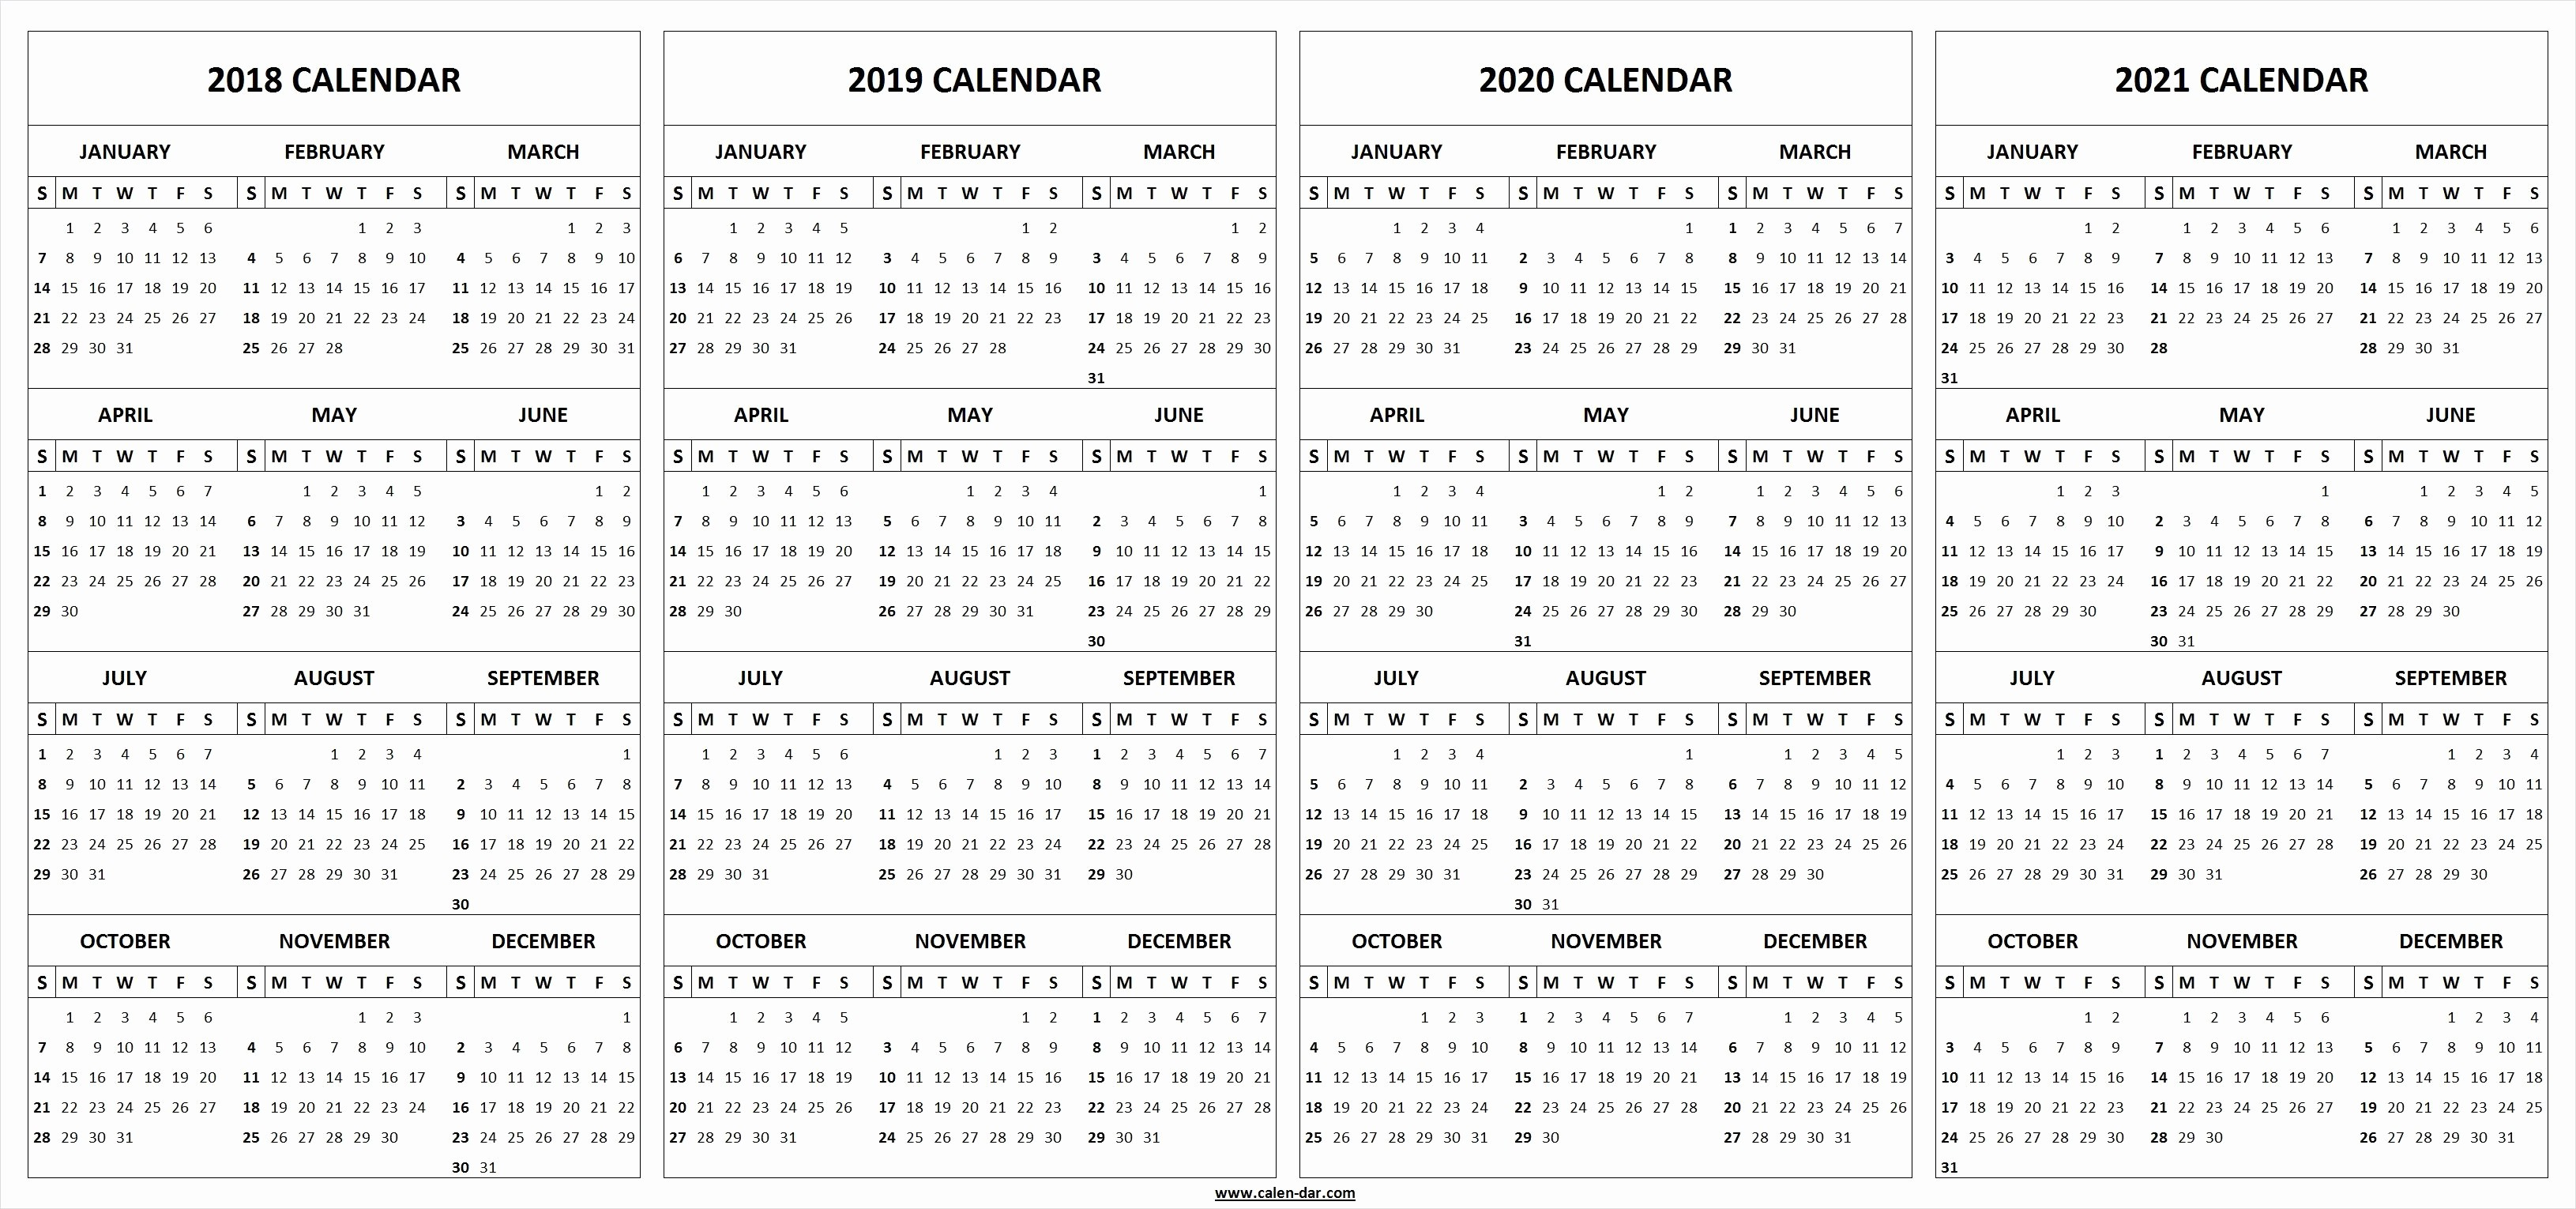 2019 and 2020 Calendar Printable Beautiful 4 Four Year 2018 2019 2020 2021 Calendar Printable